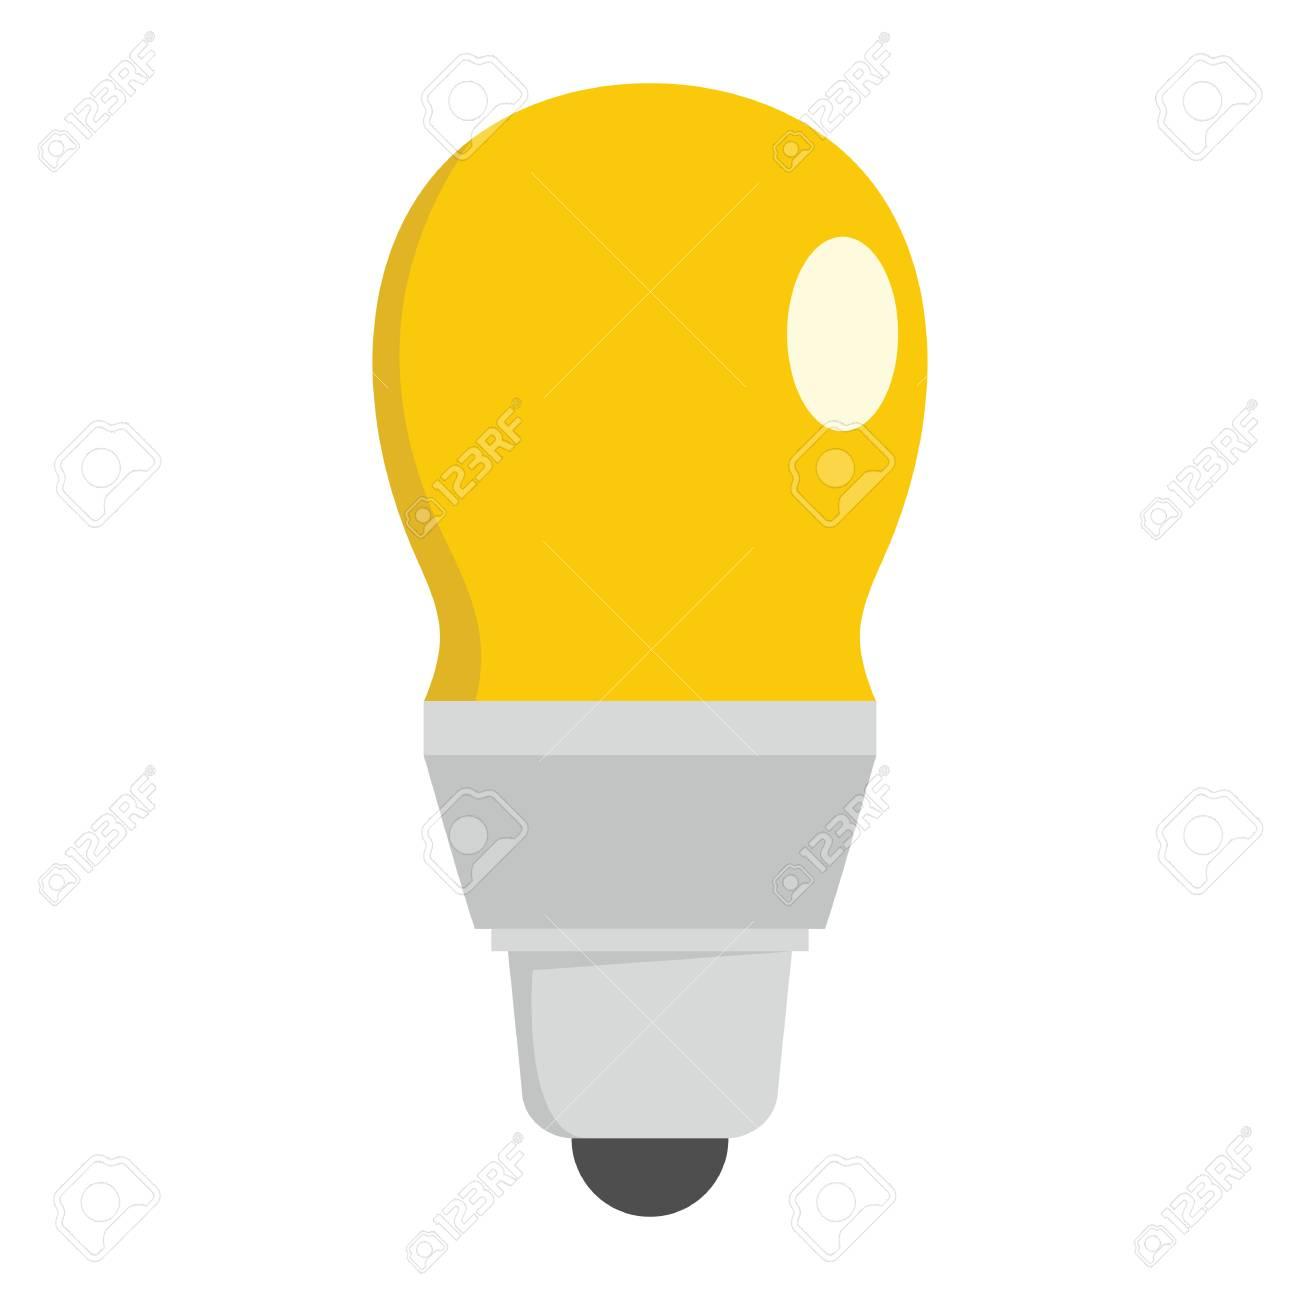 Eco Light Bulb Flat Icons Set Vector Illustration For Design